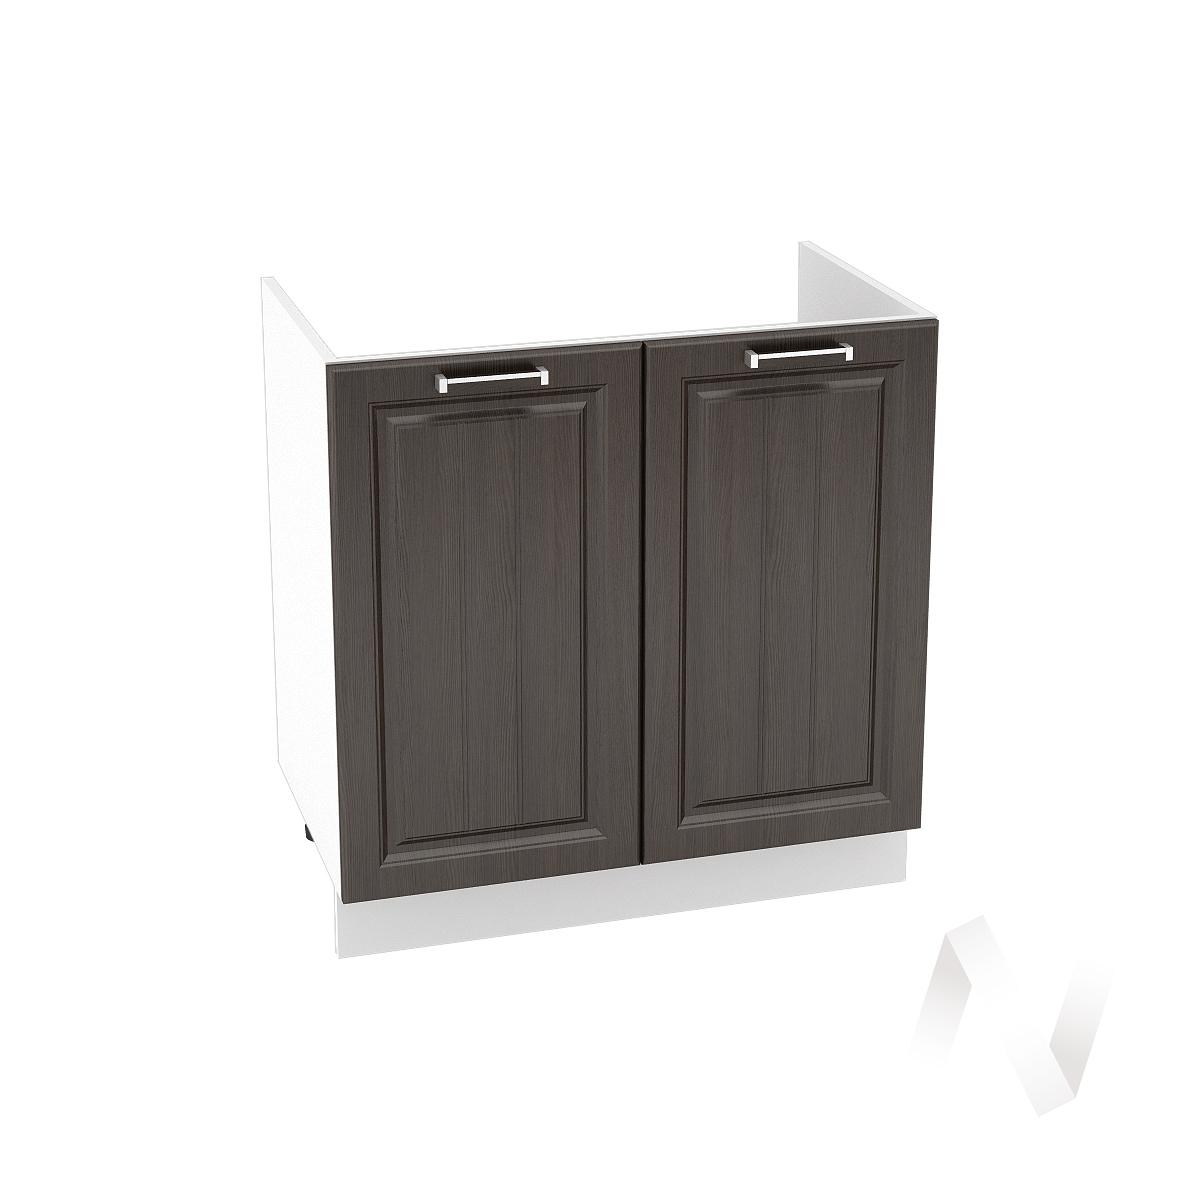 "Кухня ""Прага"": Шкаф нижний под мойку 800, ШНМ 800 (венге/корпус белый)"